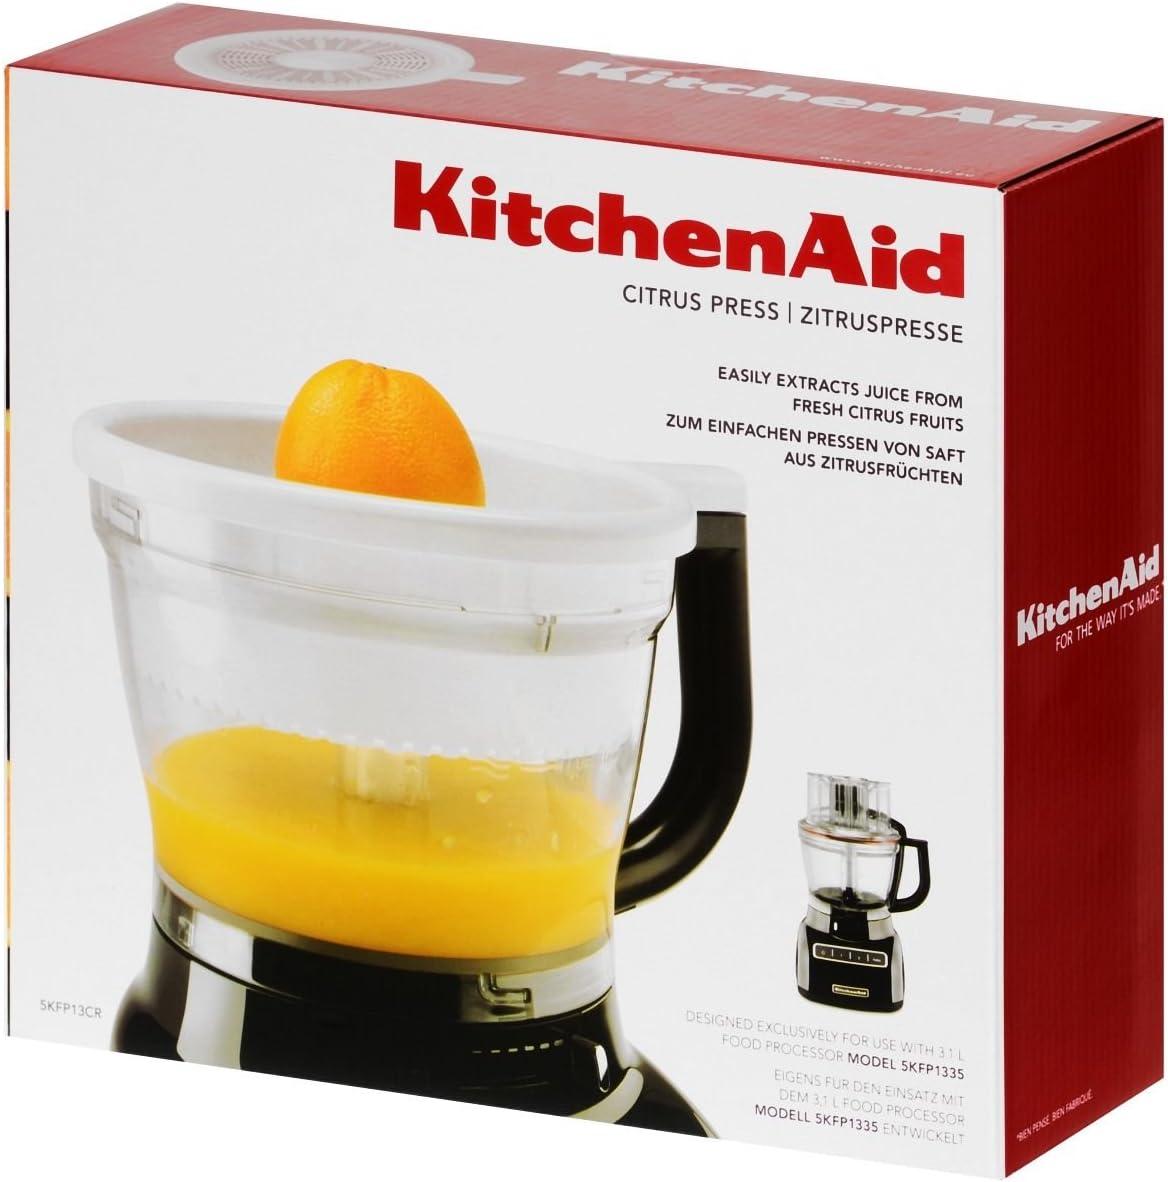 Kitchenaid Je Presse Agrumes: : Cuisine & Maison